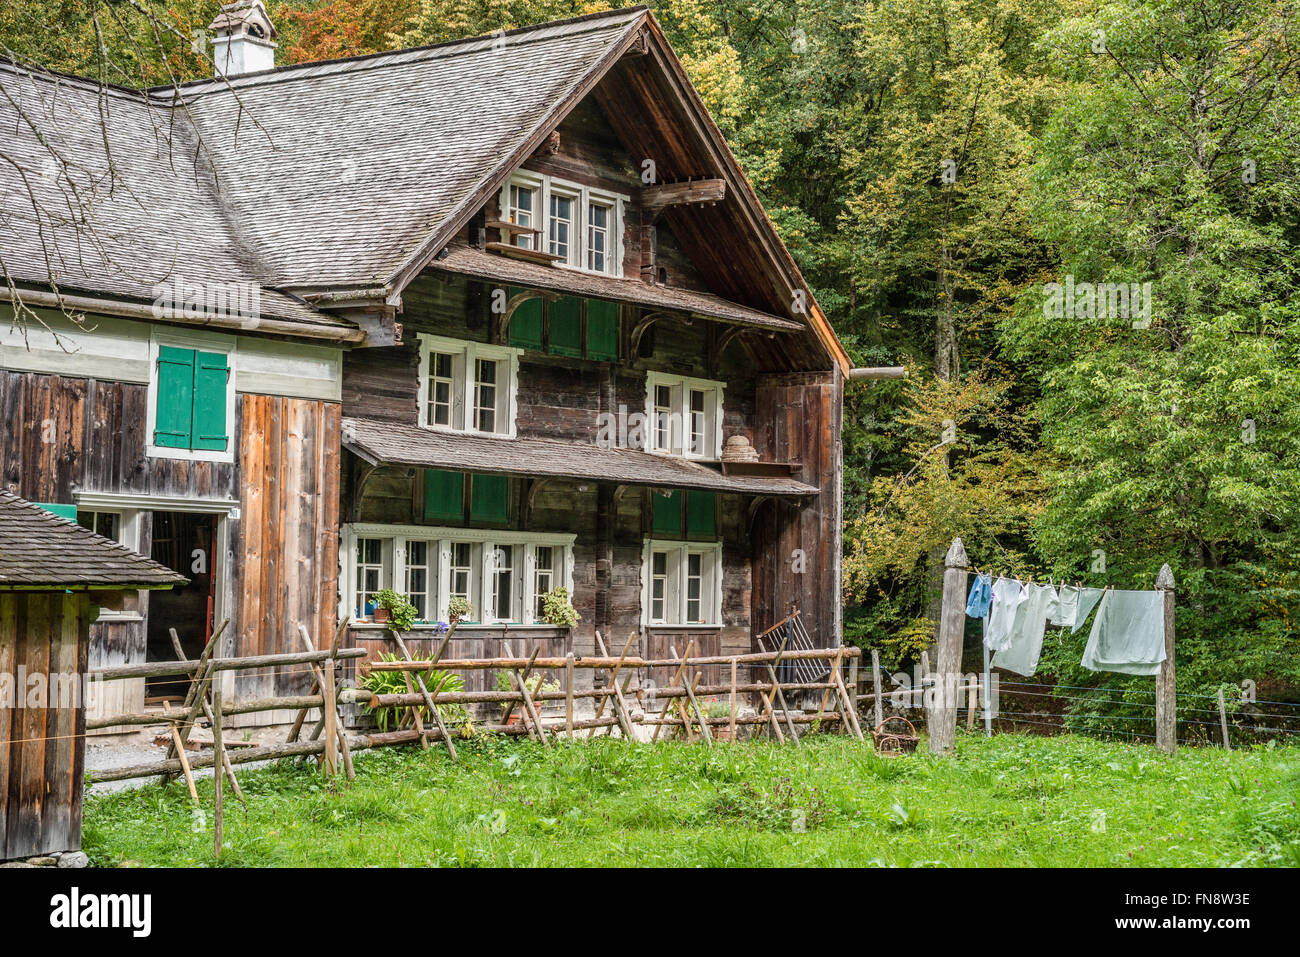 Bruelisau Farmhouse, Open Air Museum Ballenberg, Bern, Switzerland | Bruelisau Bauernhaus, Freilichtmuseum Ballenberg, - Stock Image